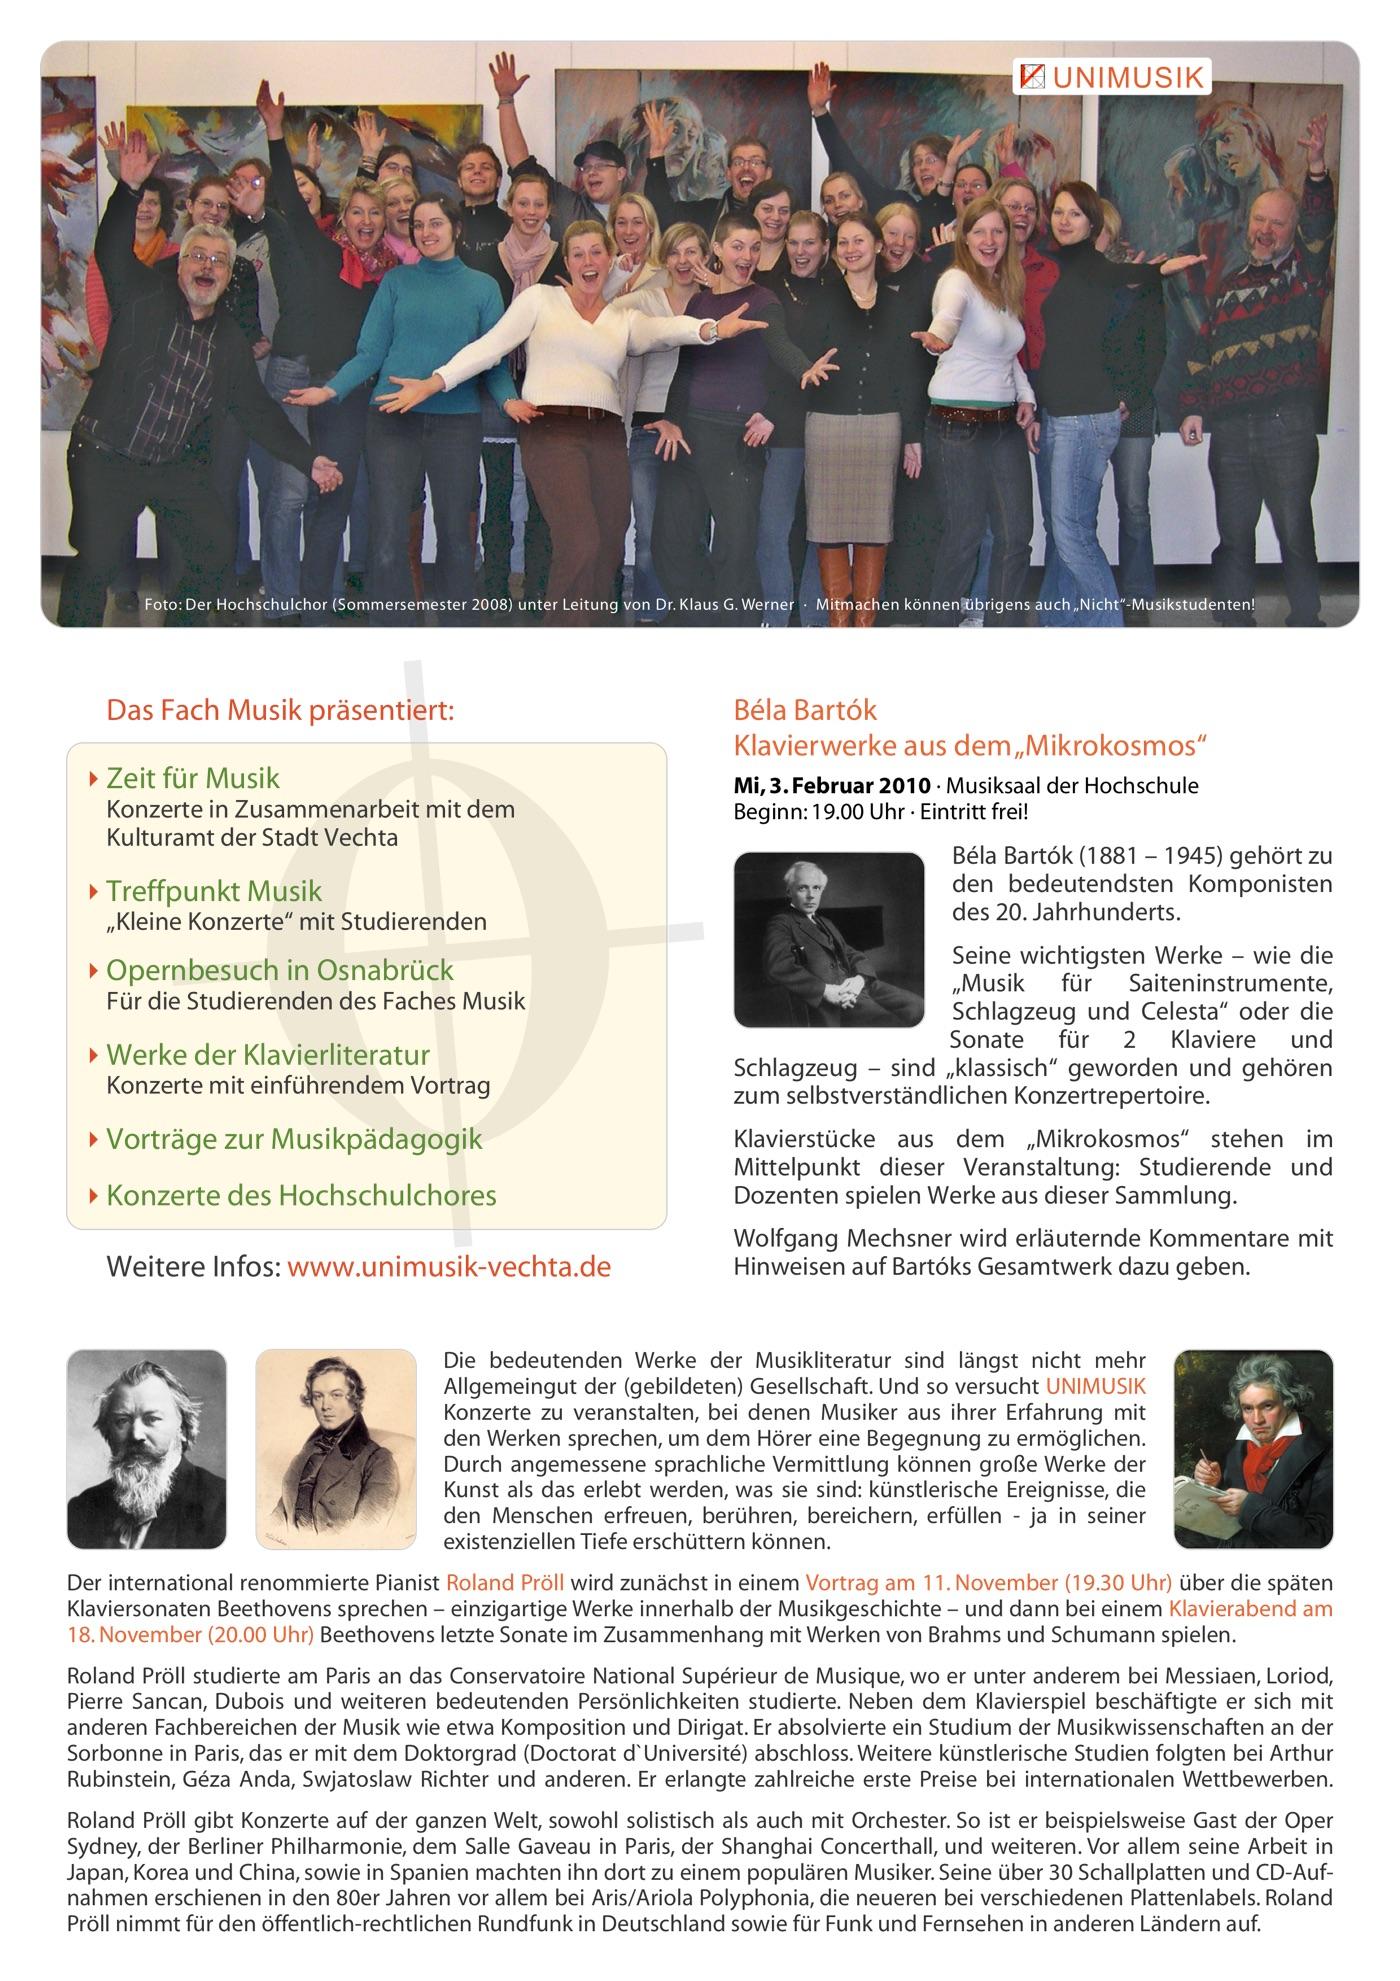 Flyer Winter 2009/10 · UNIMUSIK